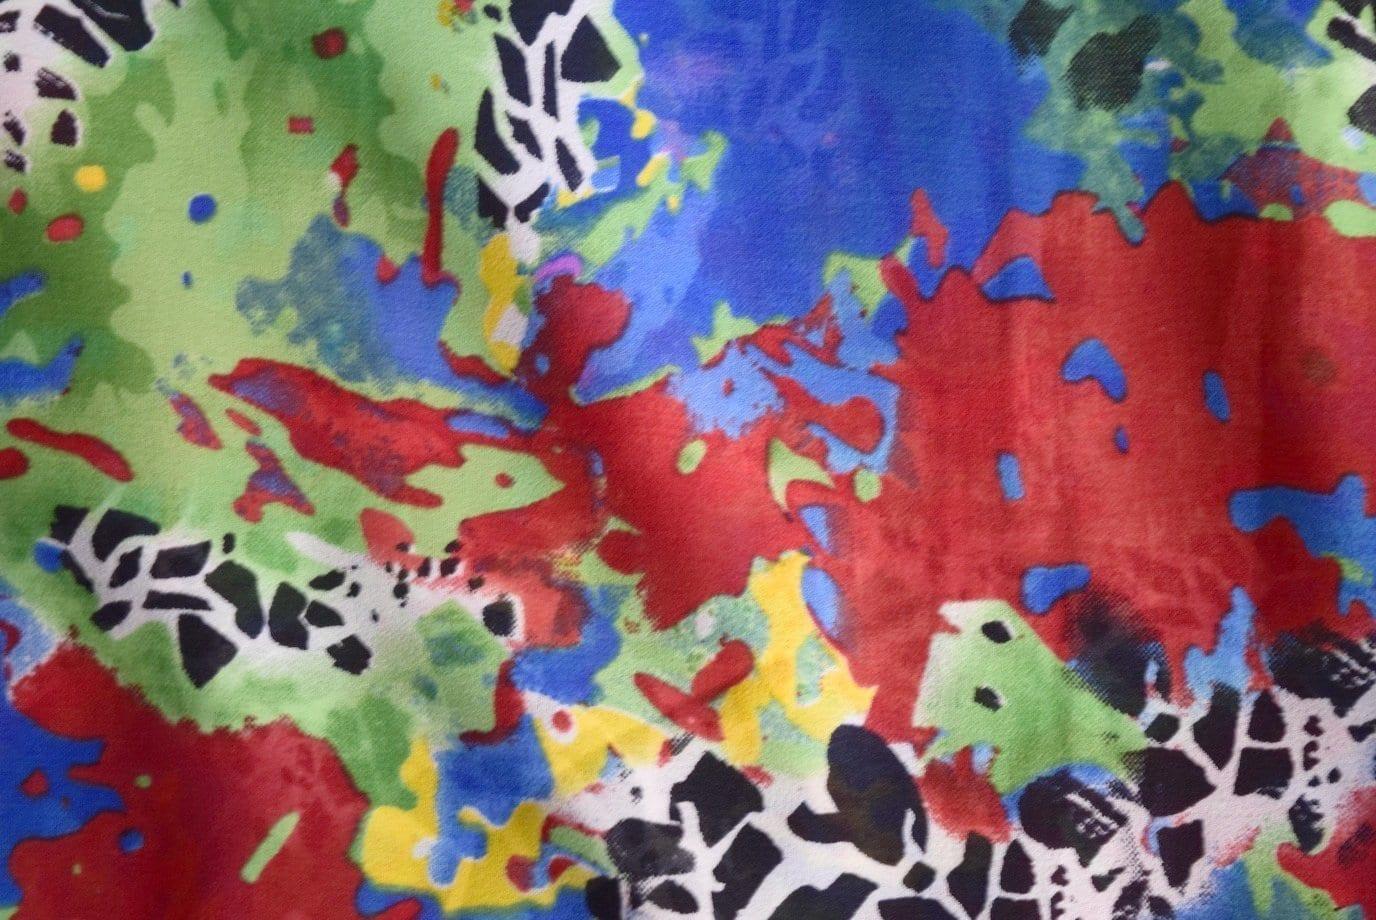 GEORGETTE PRINTED fabric for Kurti, Saree, Salwar, Dupatta GF021 3